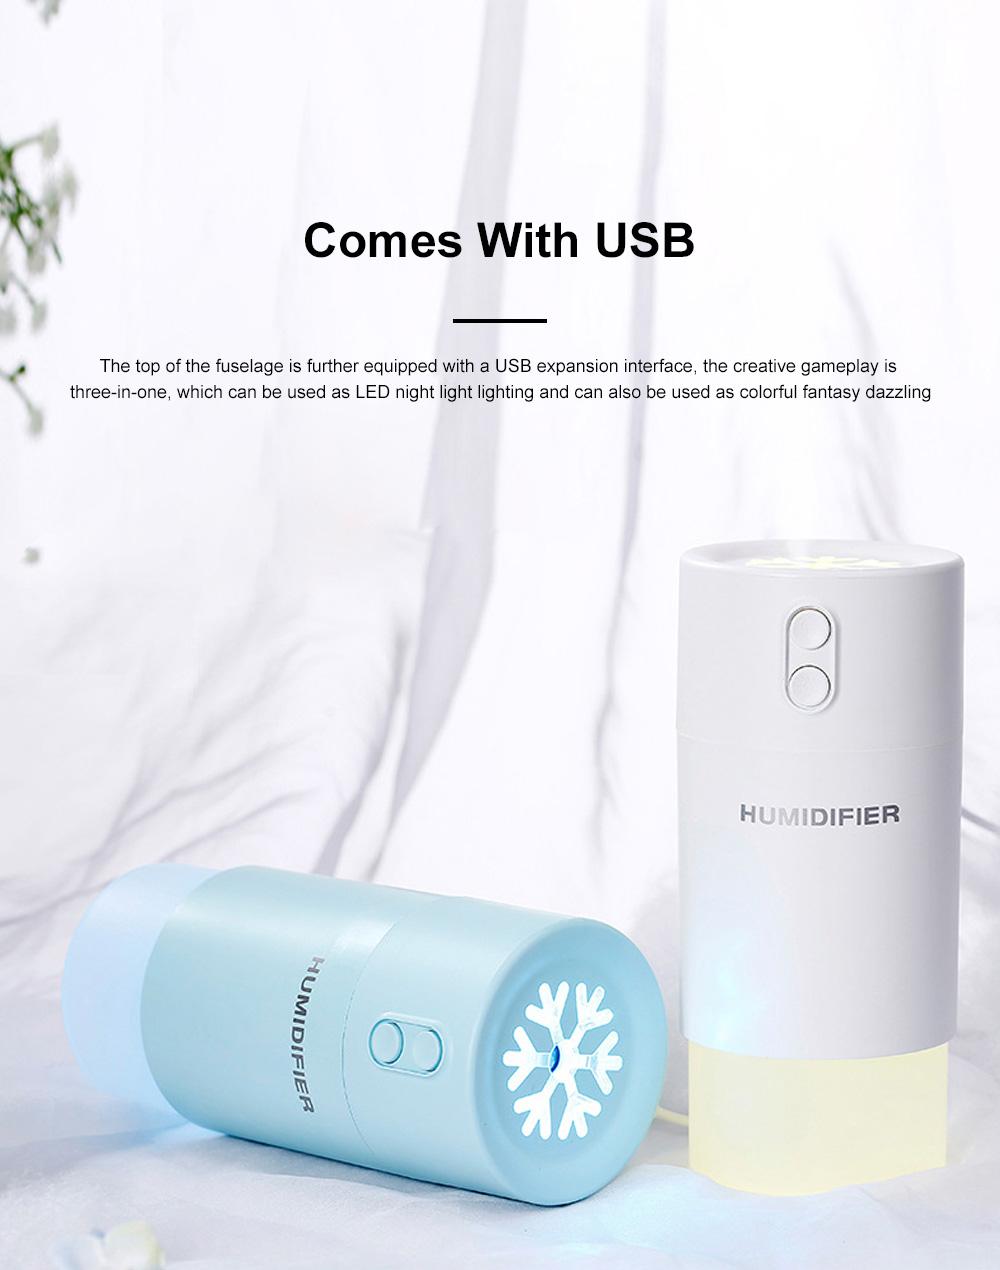 Mini Air Humidifier For Home Office Car LED Night Light Portable Snowflake Purifier Freshener Travel Mist USB Fan Humidifier 6